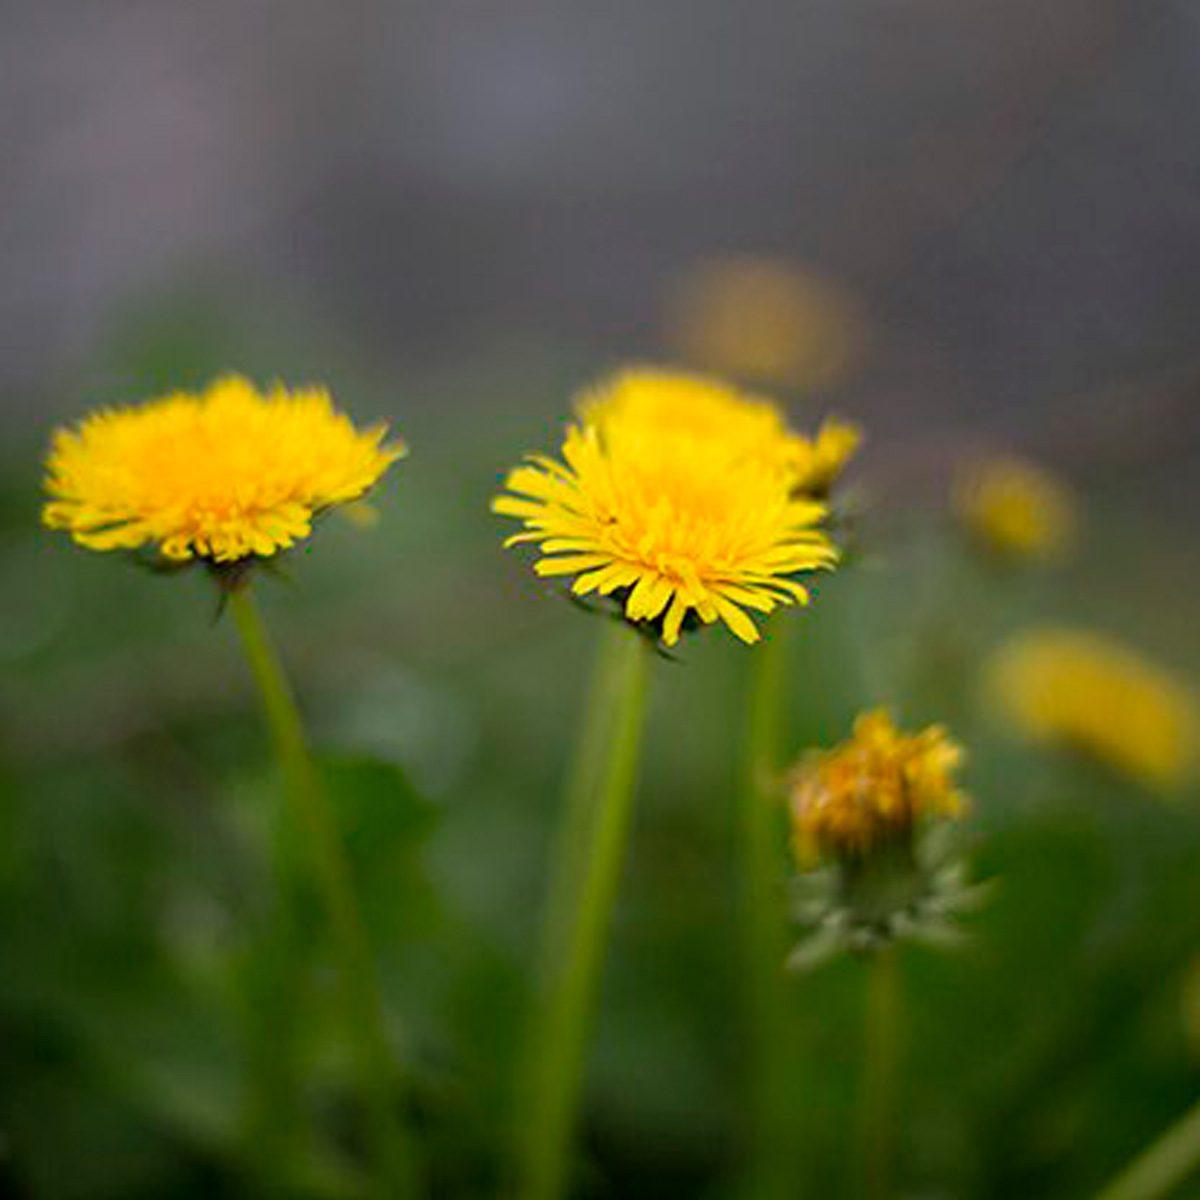 7 Surprising Facts About Dandelions